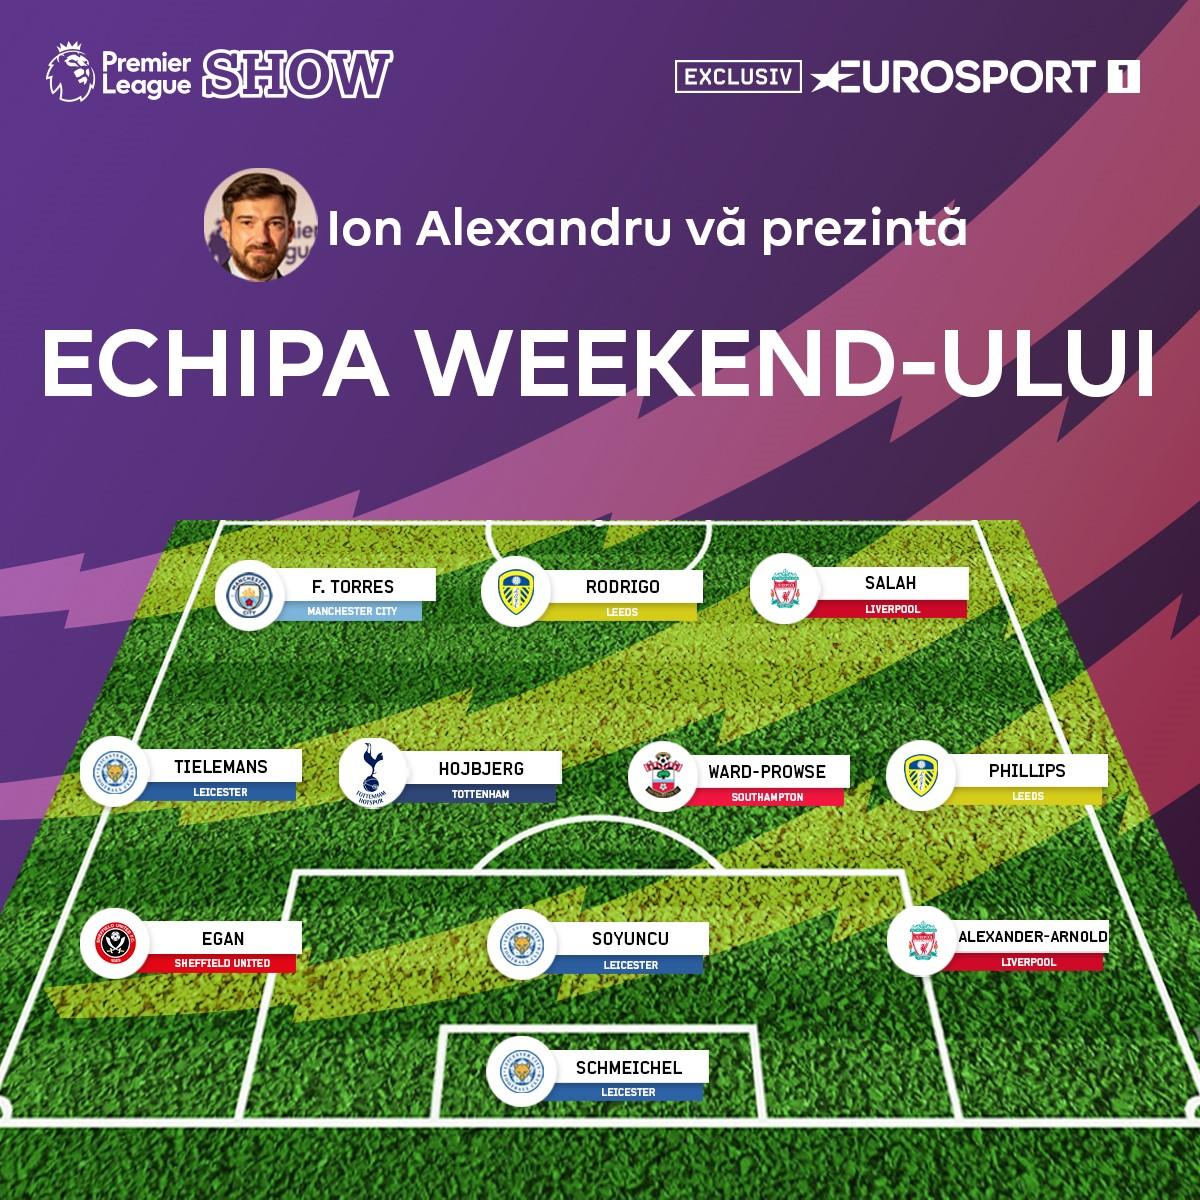 https://i.eurosport.com/2021/05/17/3134295.jpg